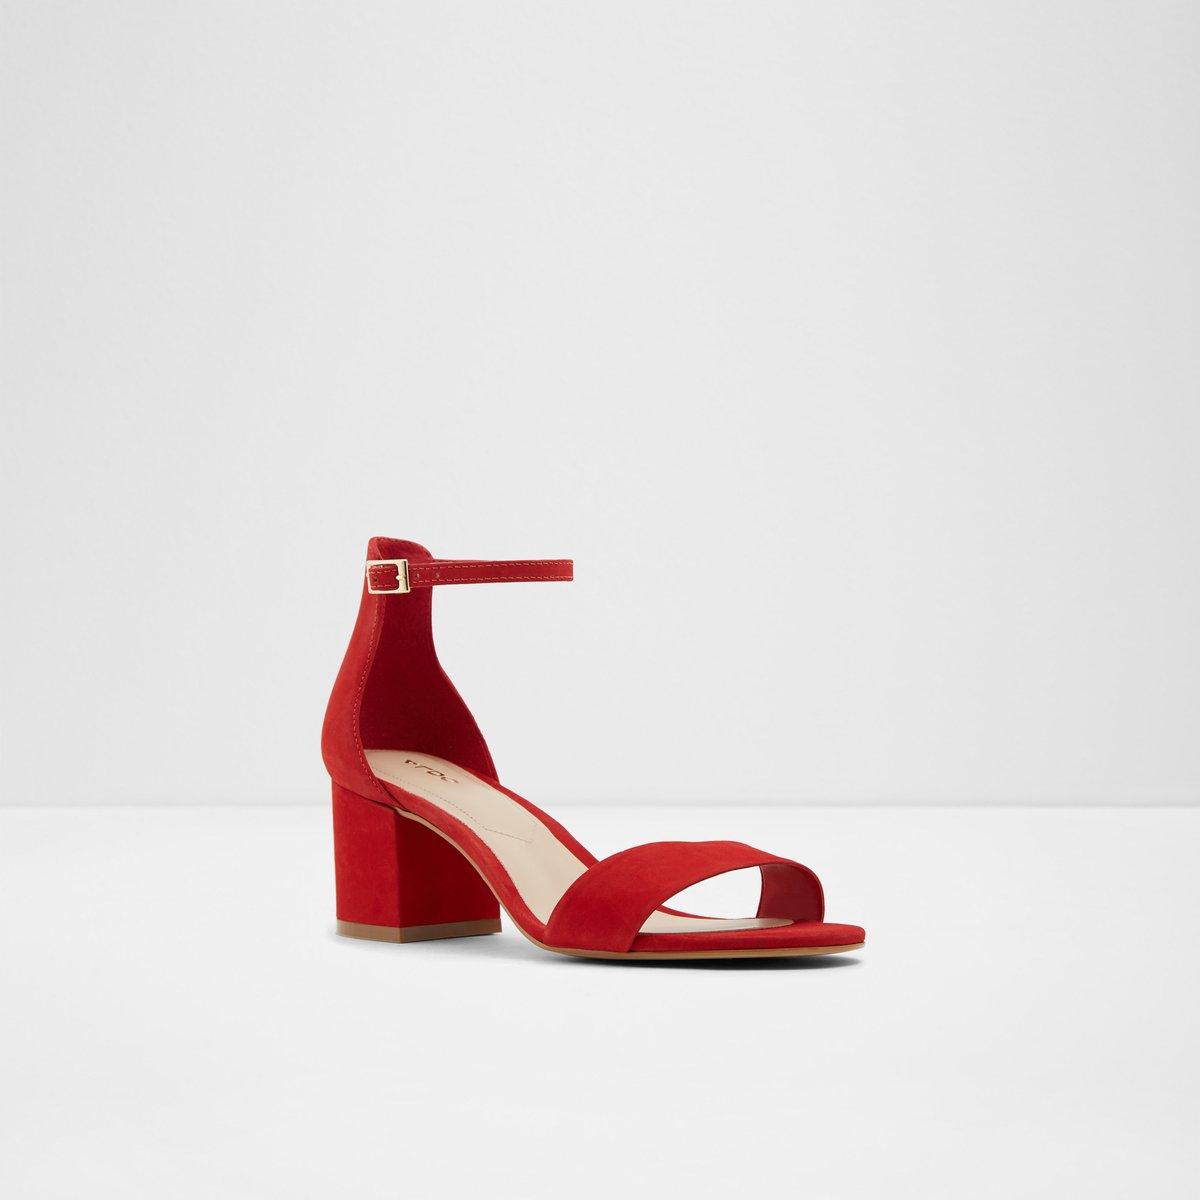 8d019defe59 Villarosaw Red Nubuck Women s Block heels